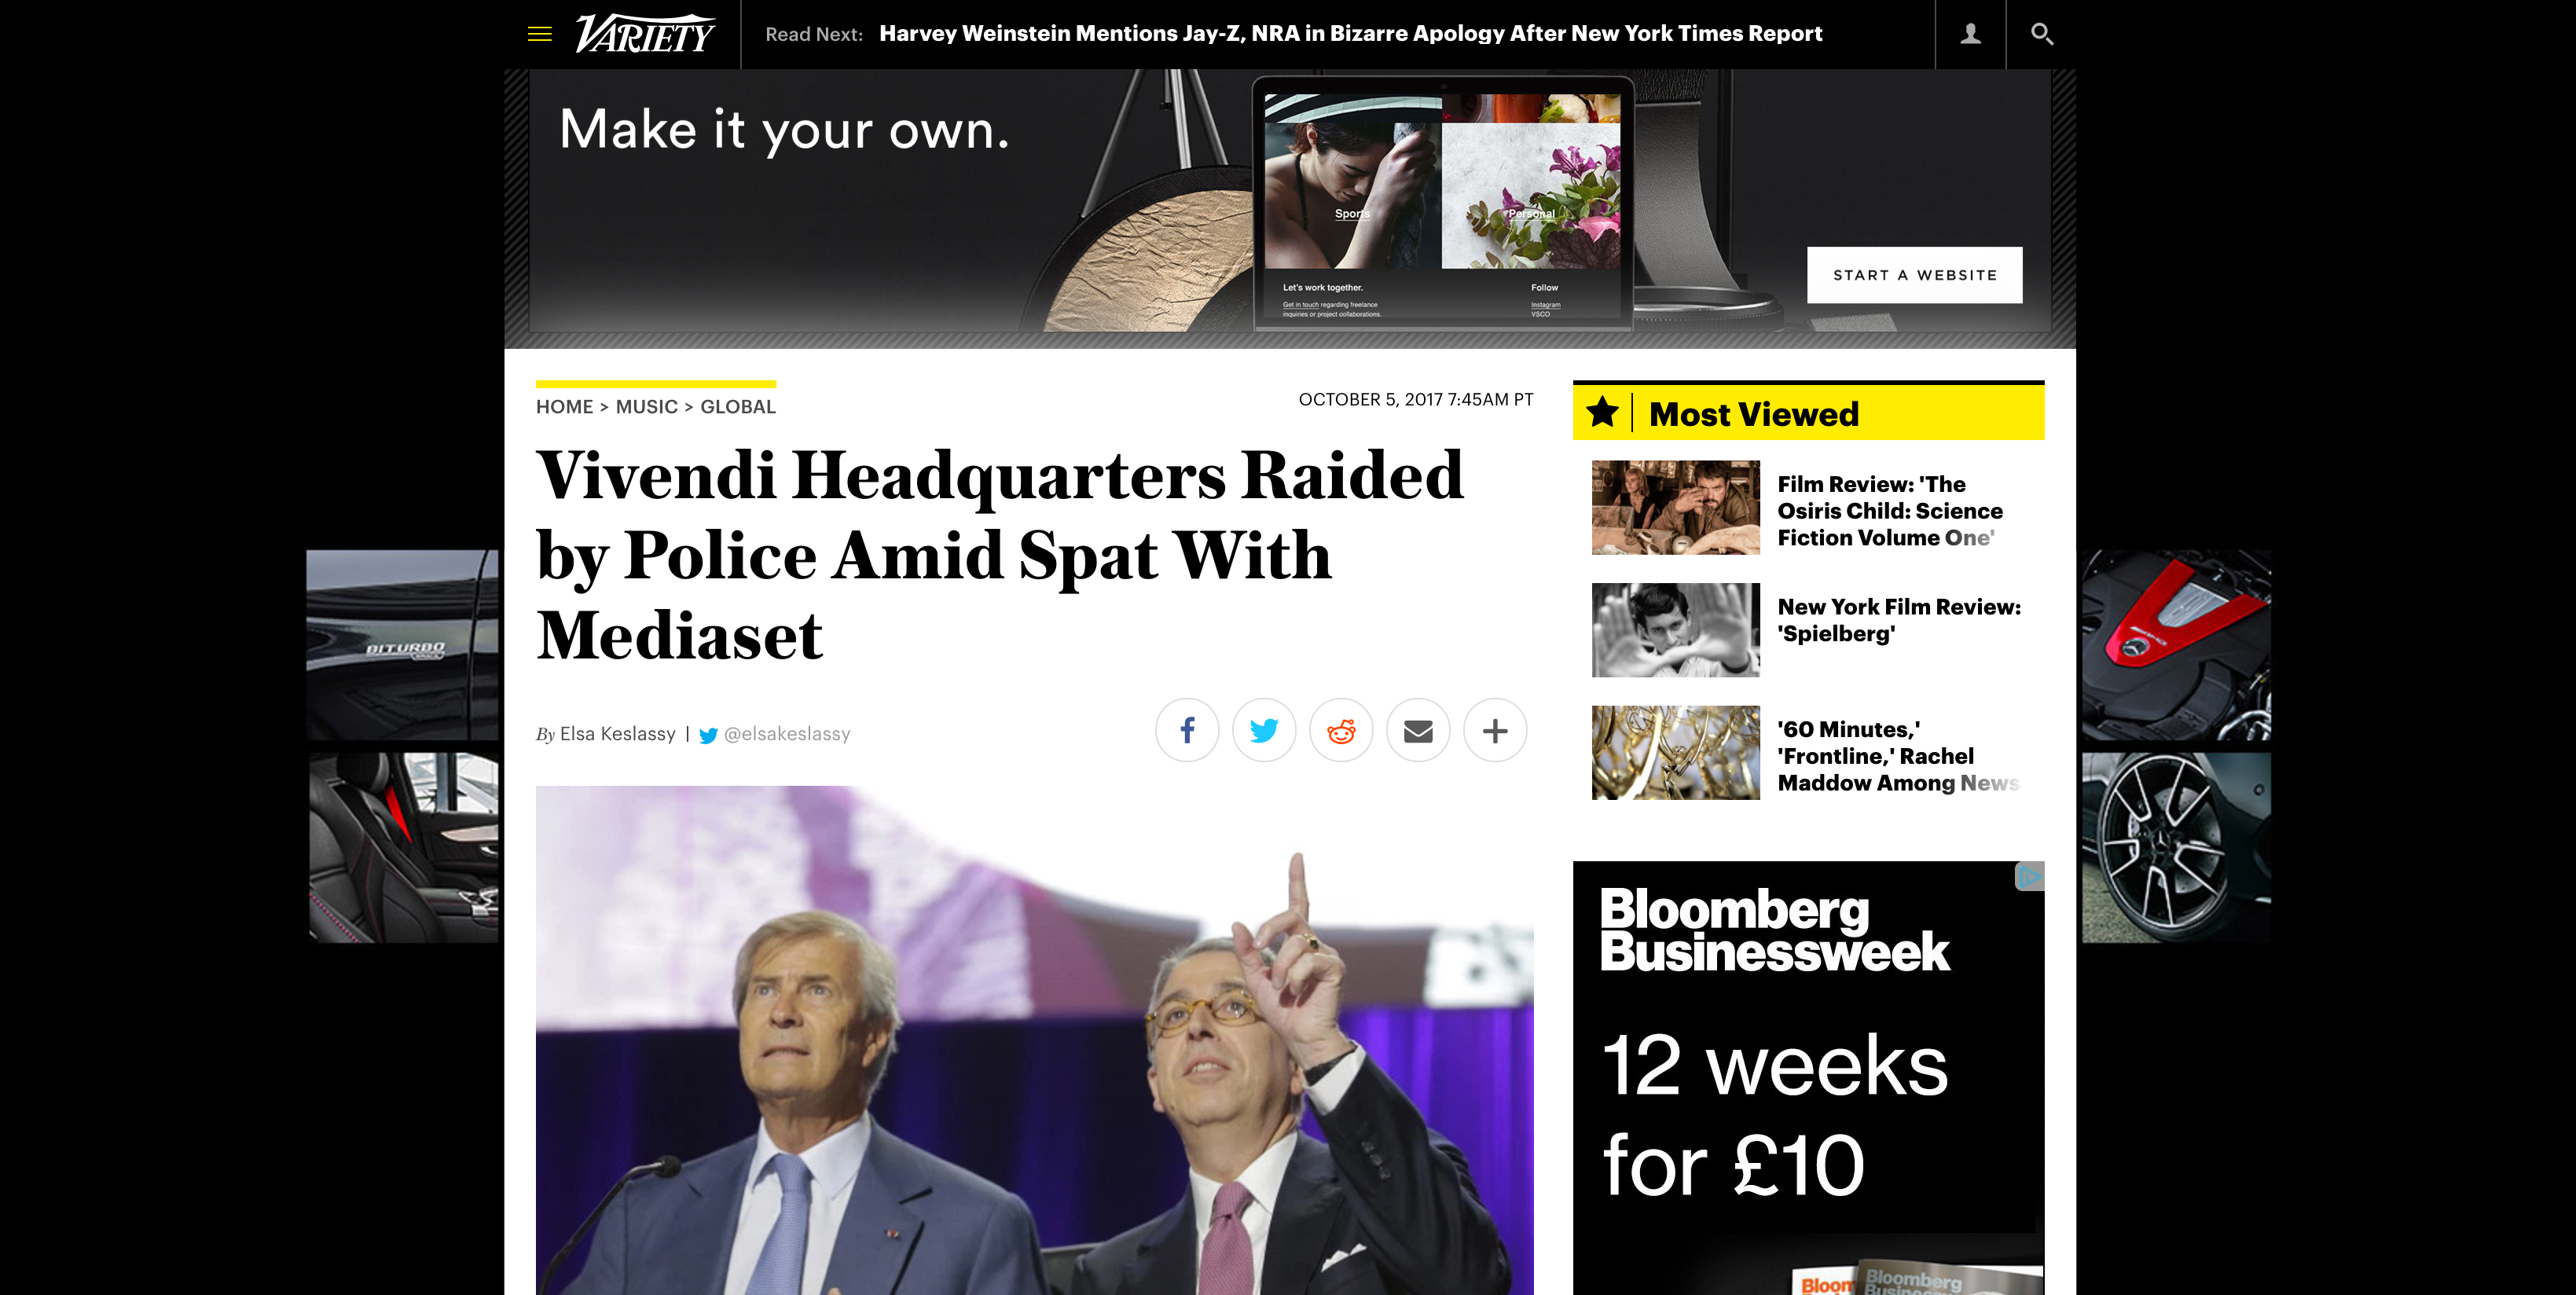 Fairness Rocks News Vivendi Headquarters Raided by Police Amid Spat With Mediaset